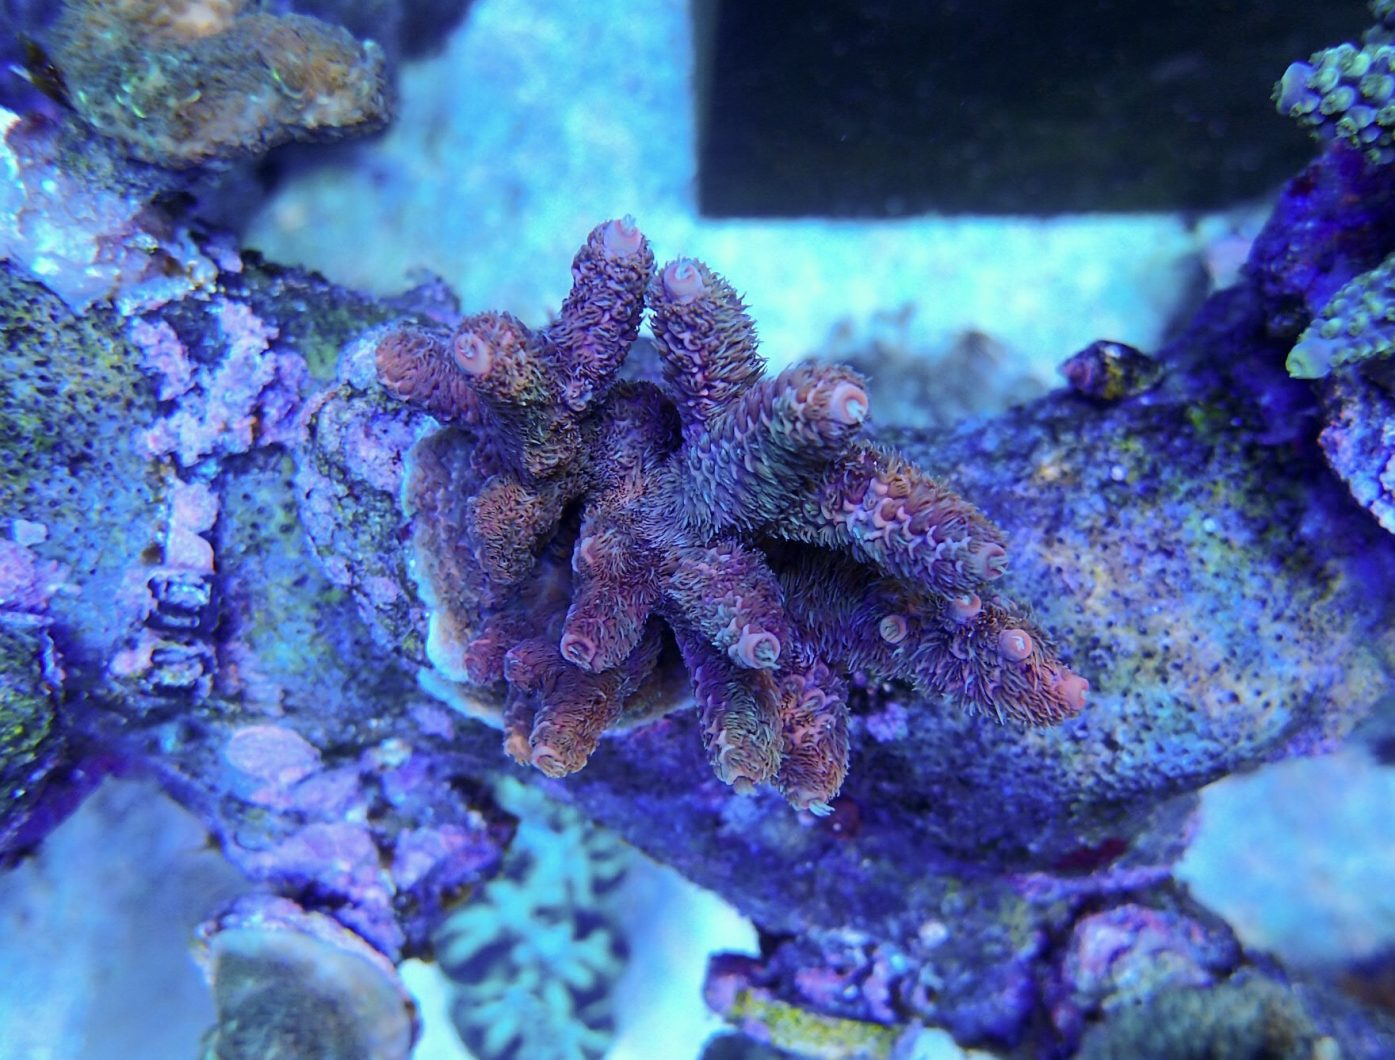 pencahayaan tangki karang air masin terbaik